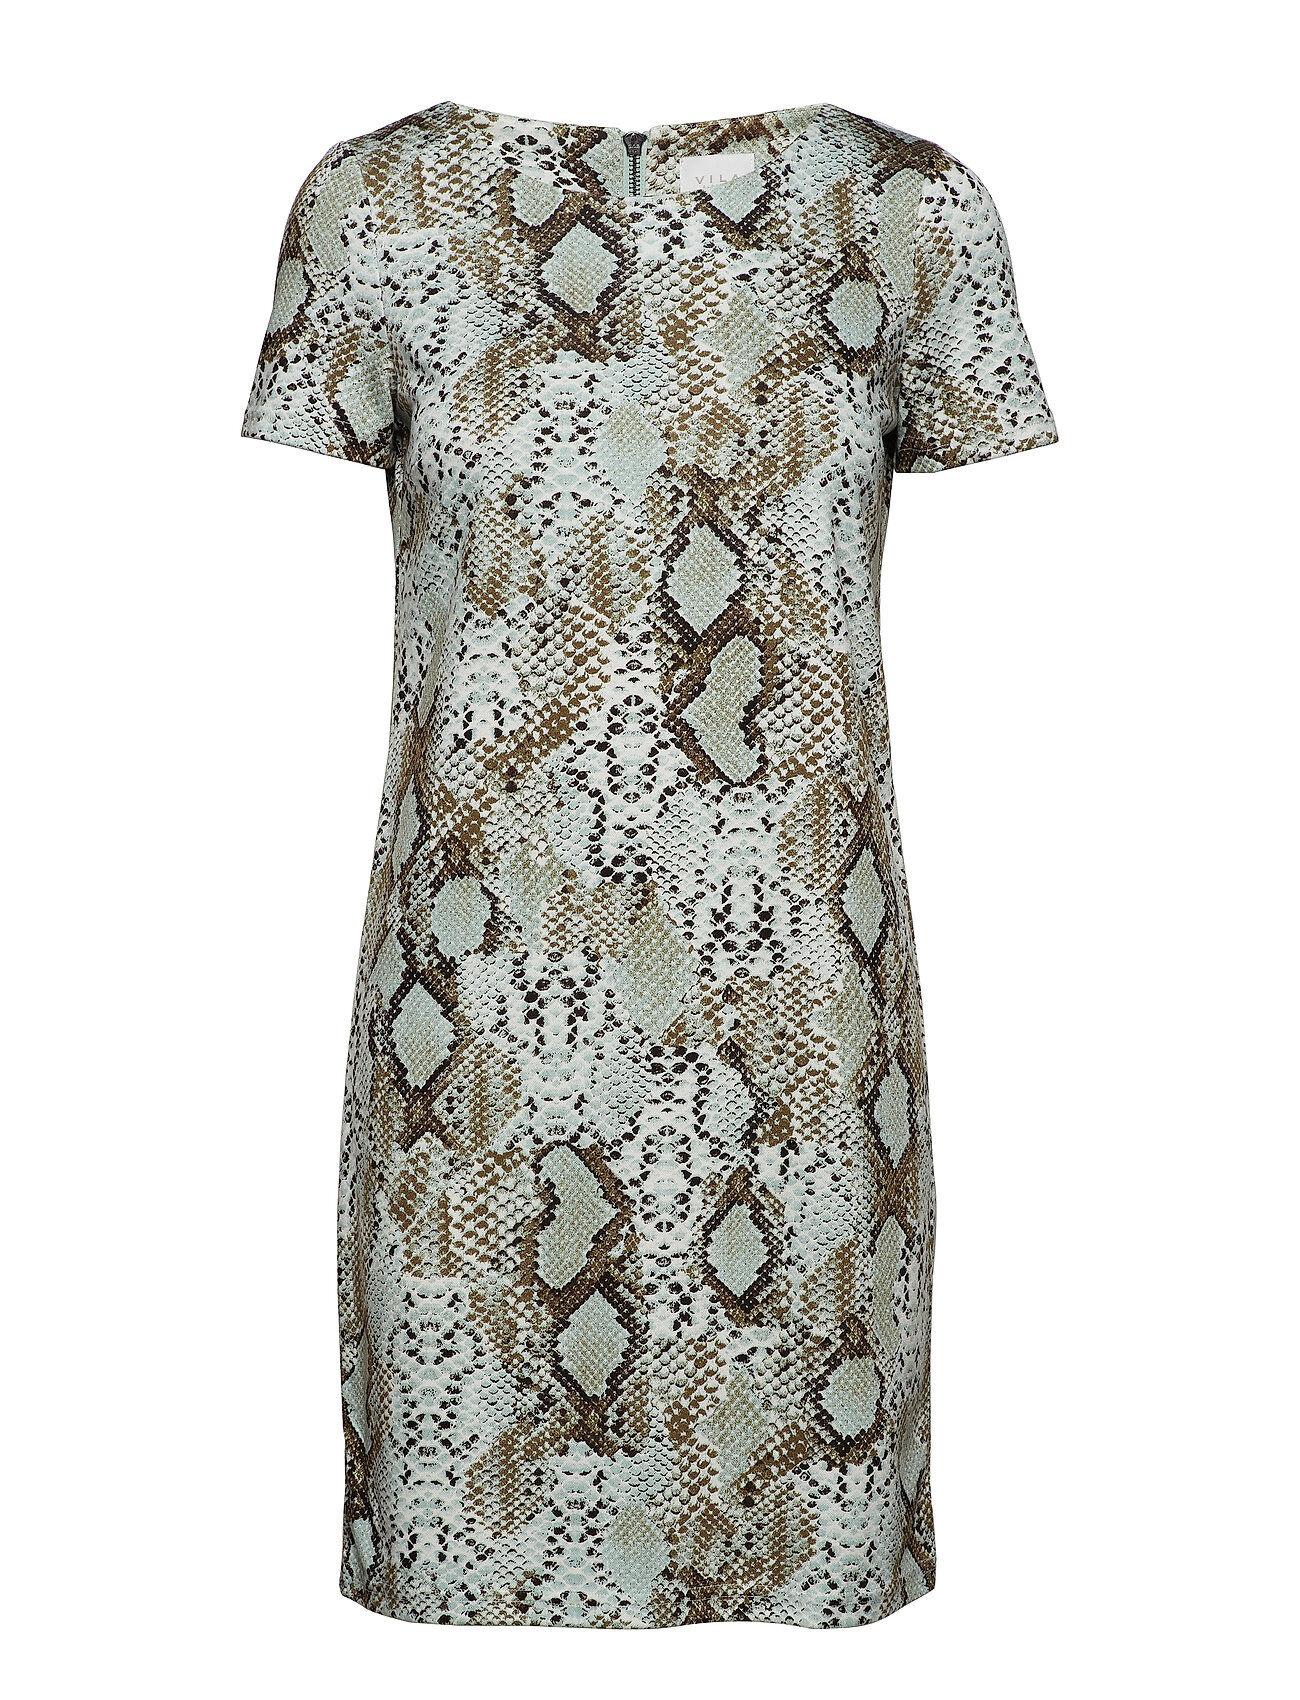 Image of VILA Vitinny New S/S Dress - Lux Lyhyt Mekko Sininen VILA